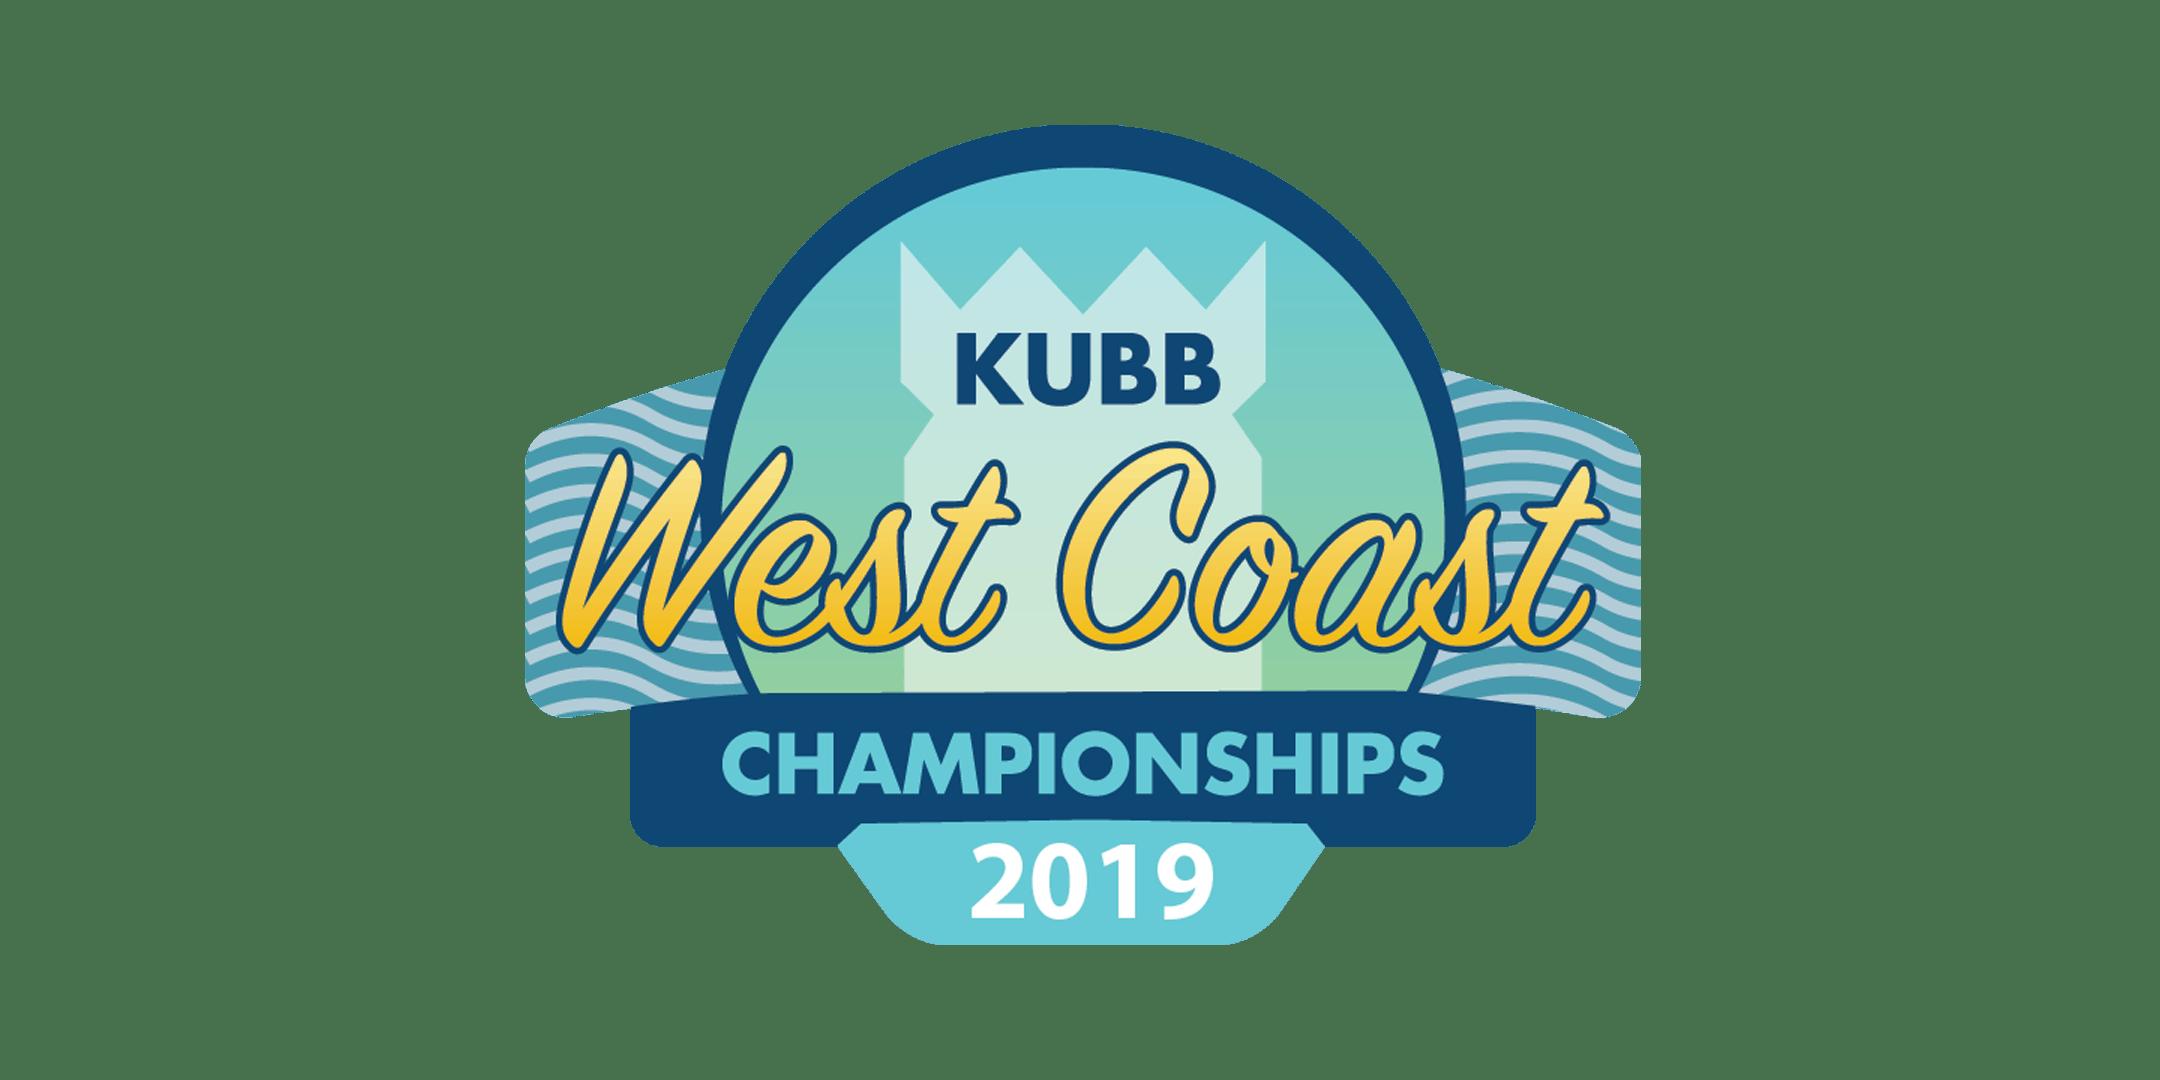 2019 West Coast Kubb Championships